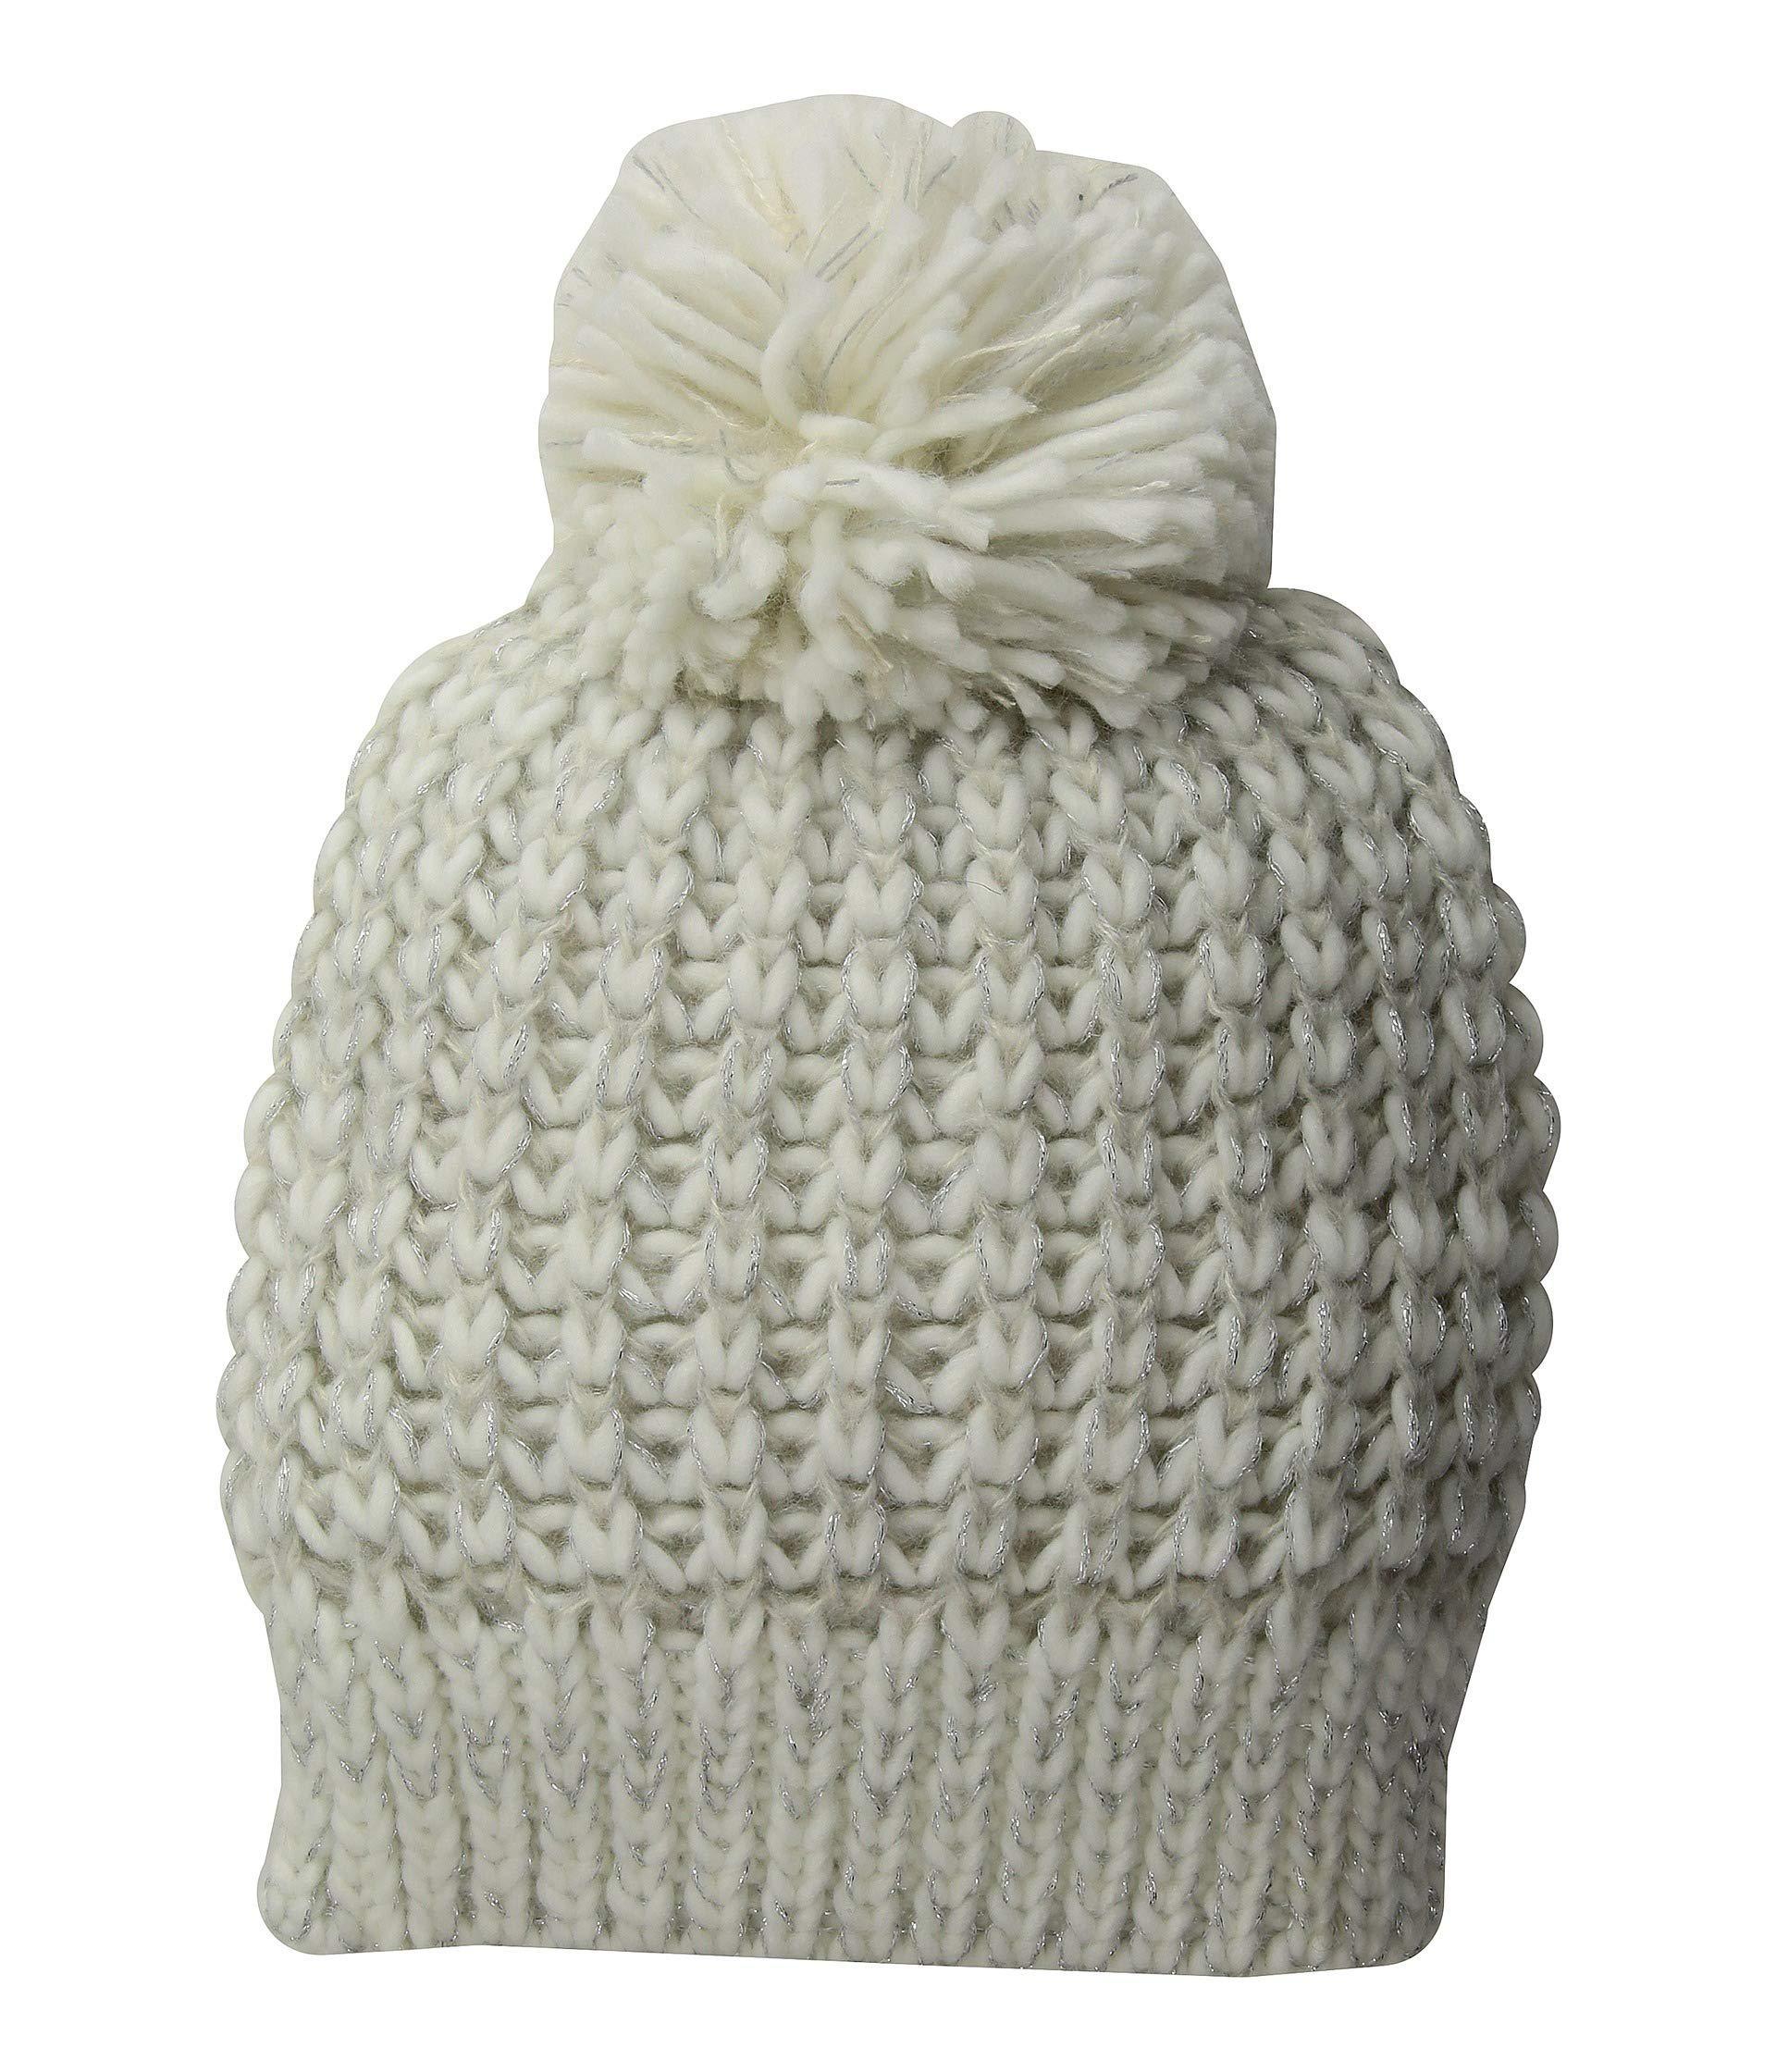 c10b93d720b San Diego Hat Company. Women s White Knh3604 Metallic Yarn Beanie With ...